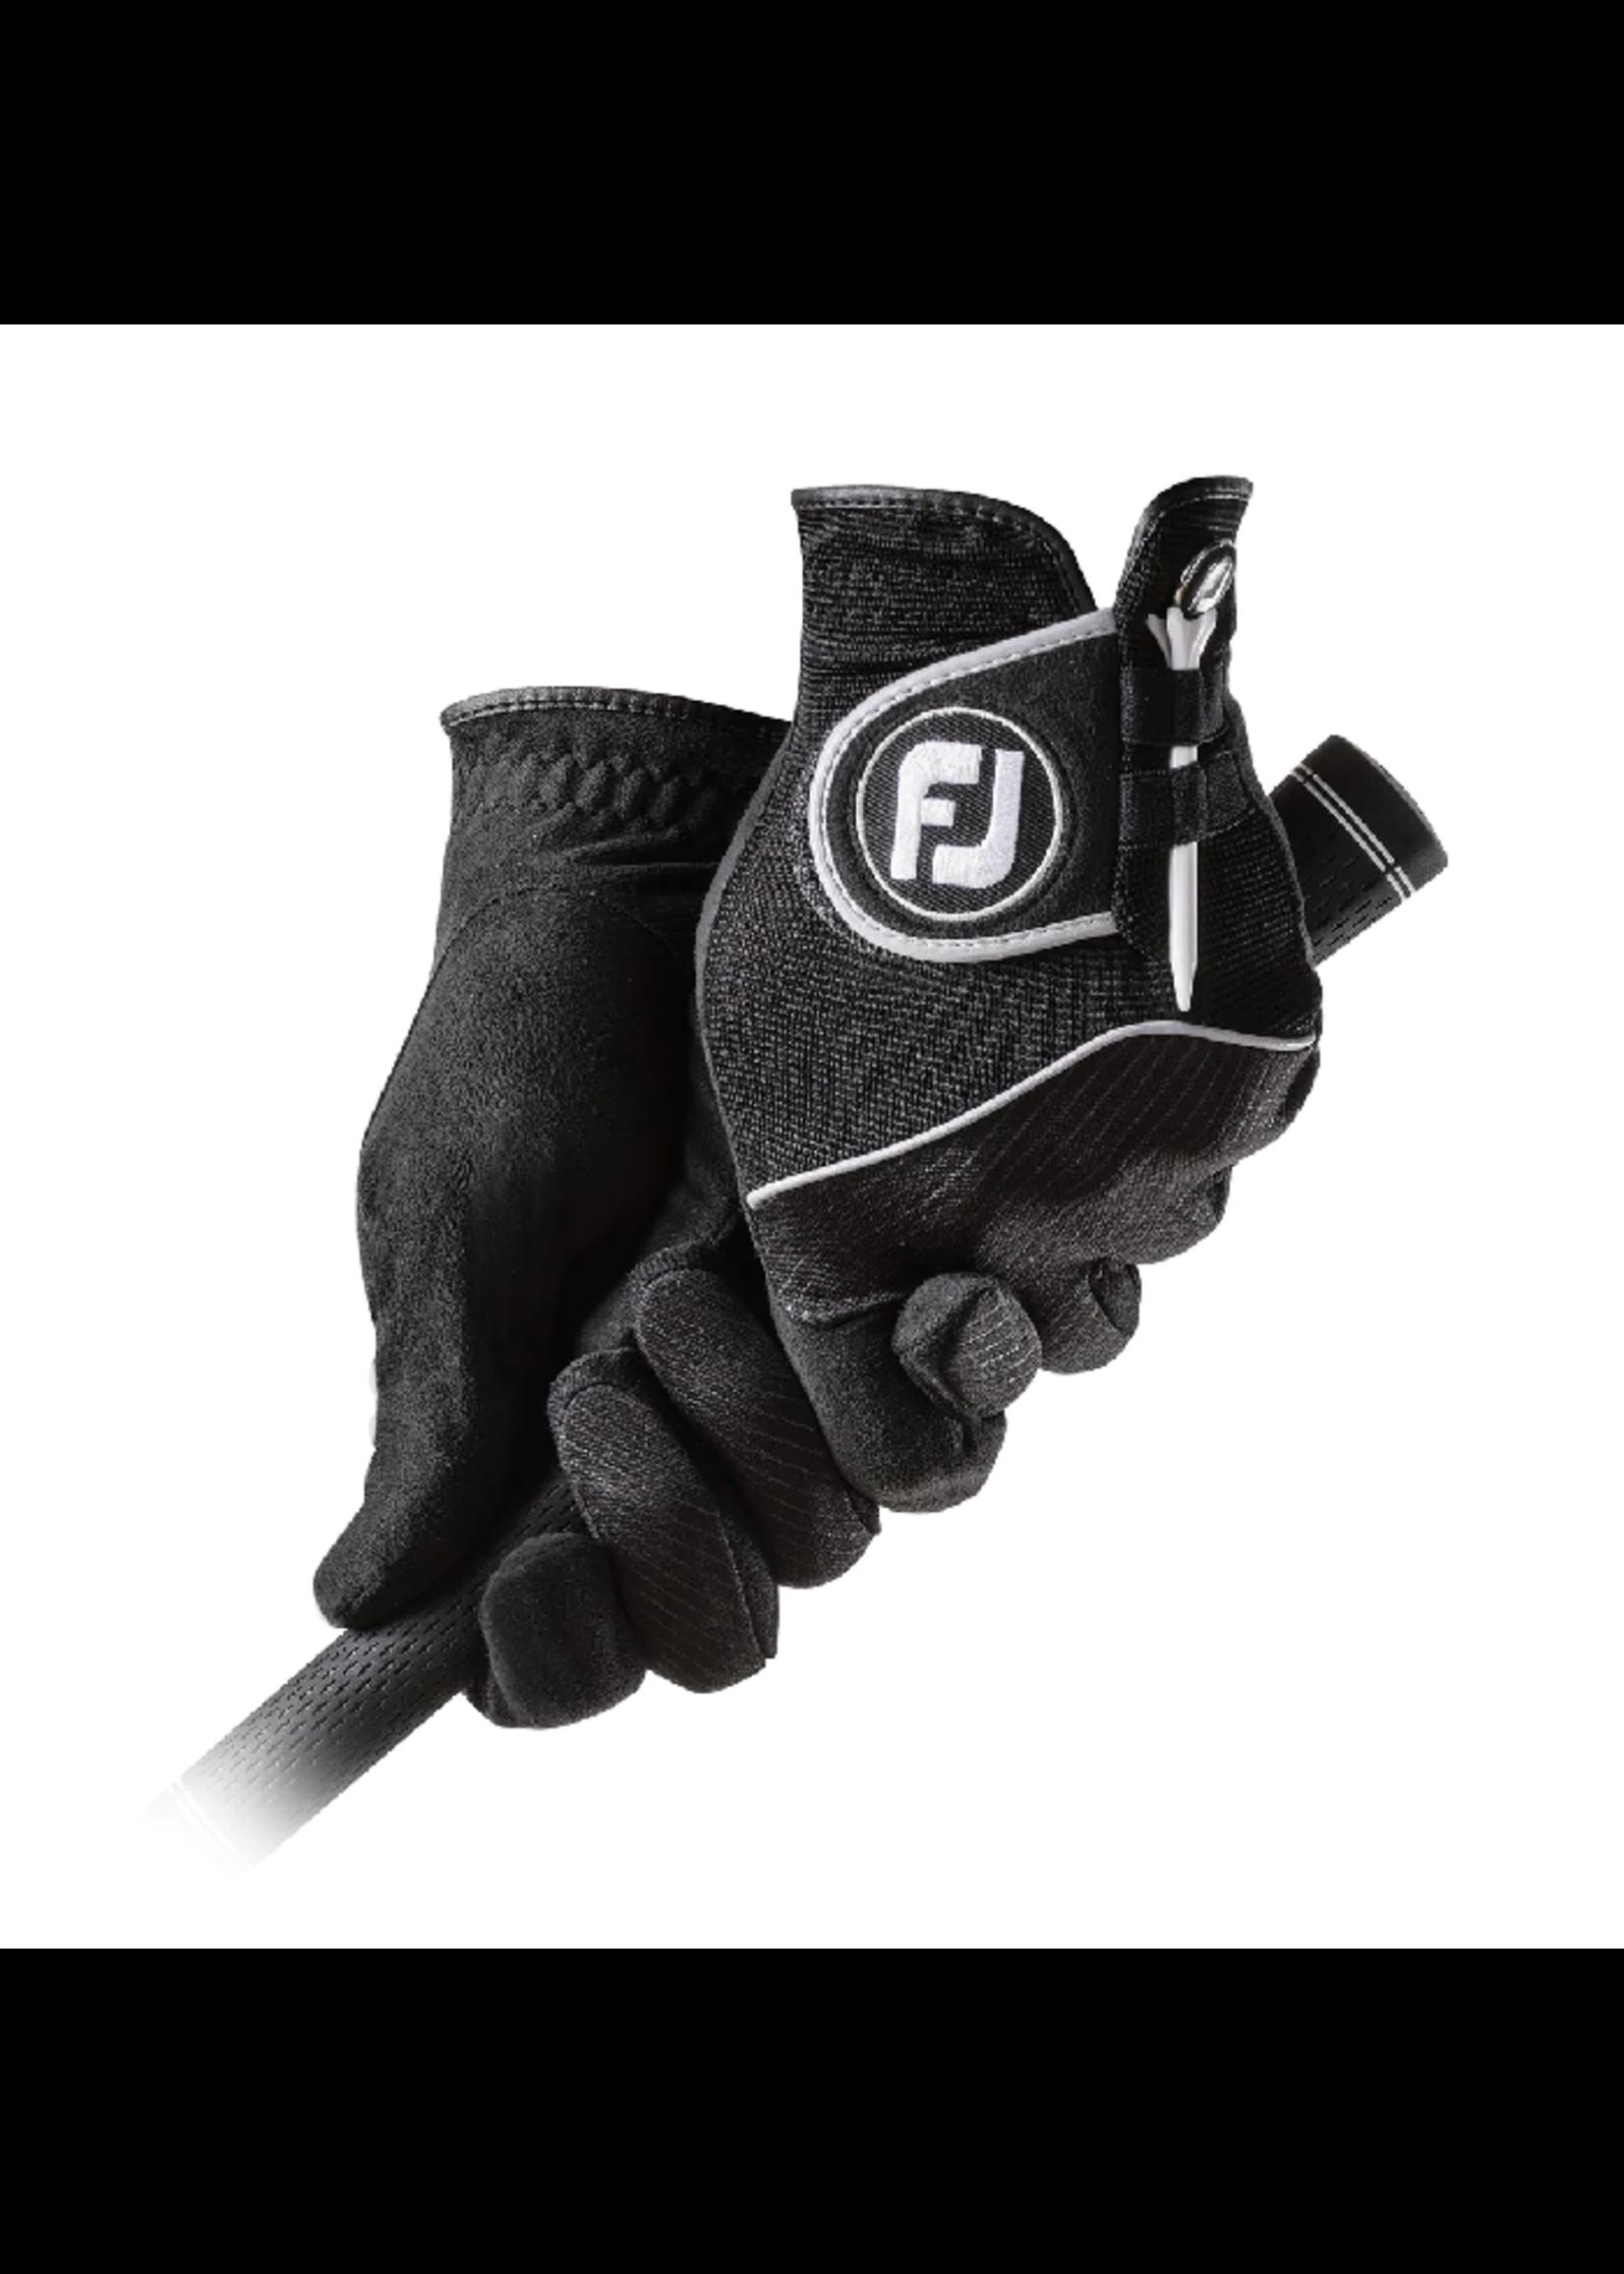 FJ Raingrip Glove Regular Men